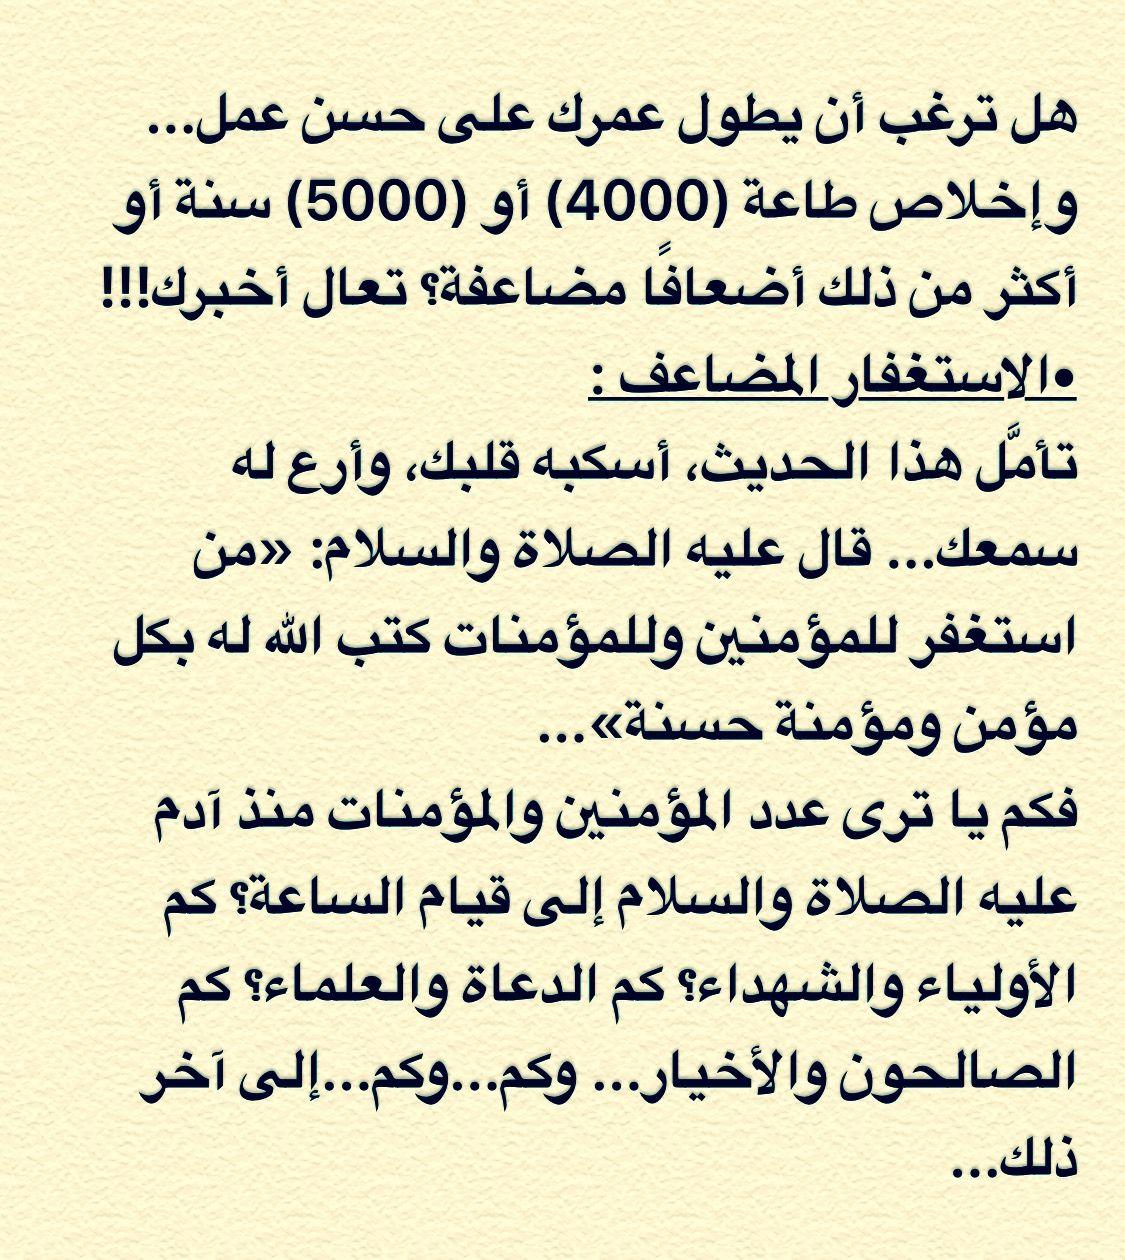 Desertrose هل ترغب أن يطول عمرك على حسن عمل وإخلاص طاعة 4000 أو 5000 سنة أو أكثر من ذلك أضعاف ا مضاعفة تعال أخبرك Math Arabic Calligraphy Calligraphy